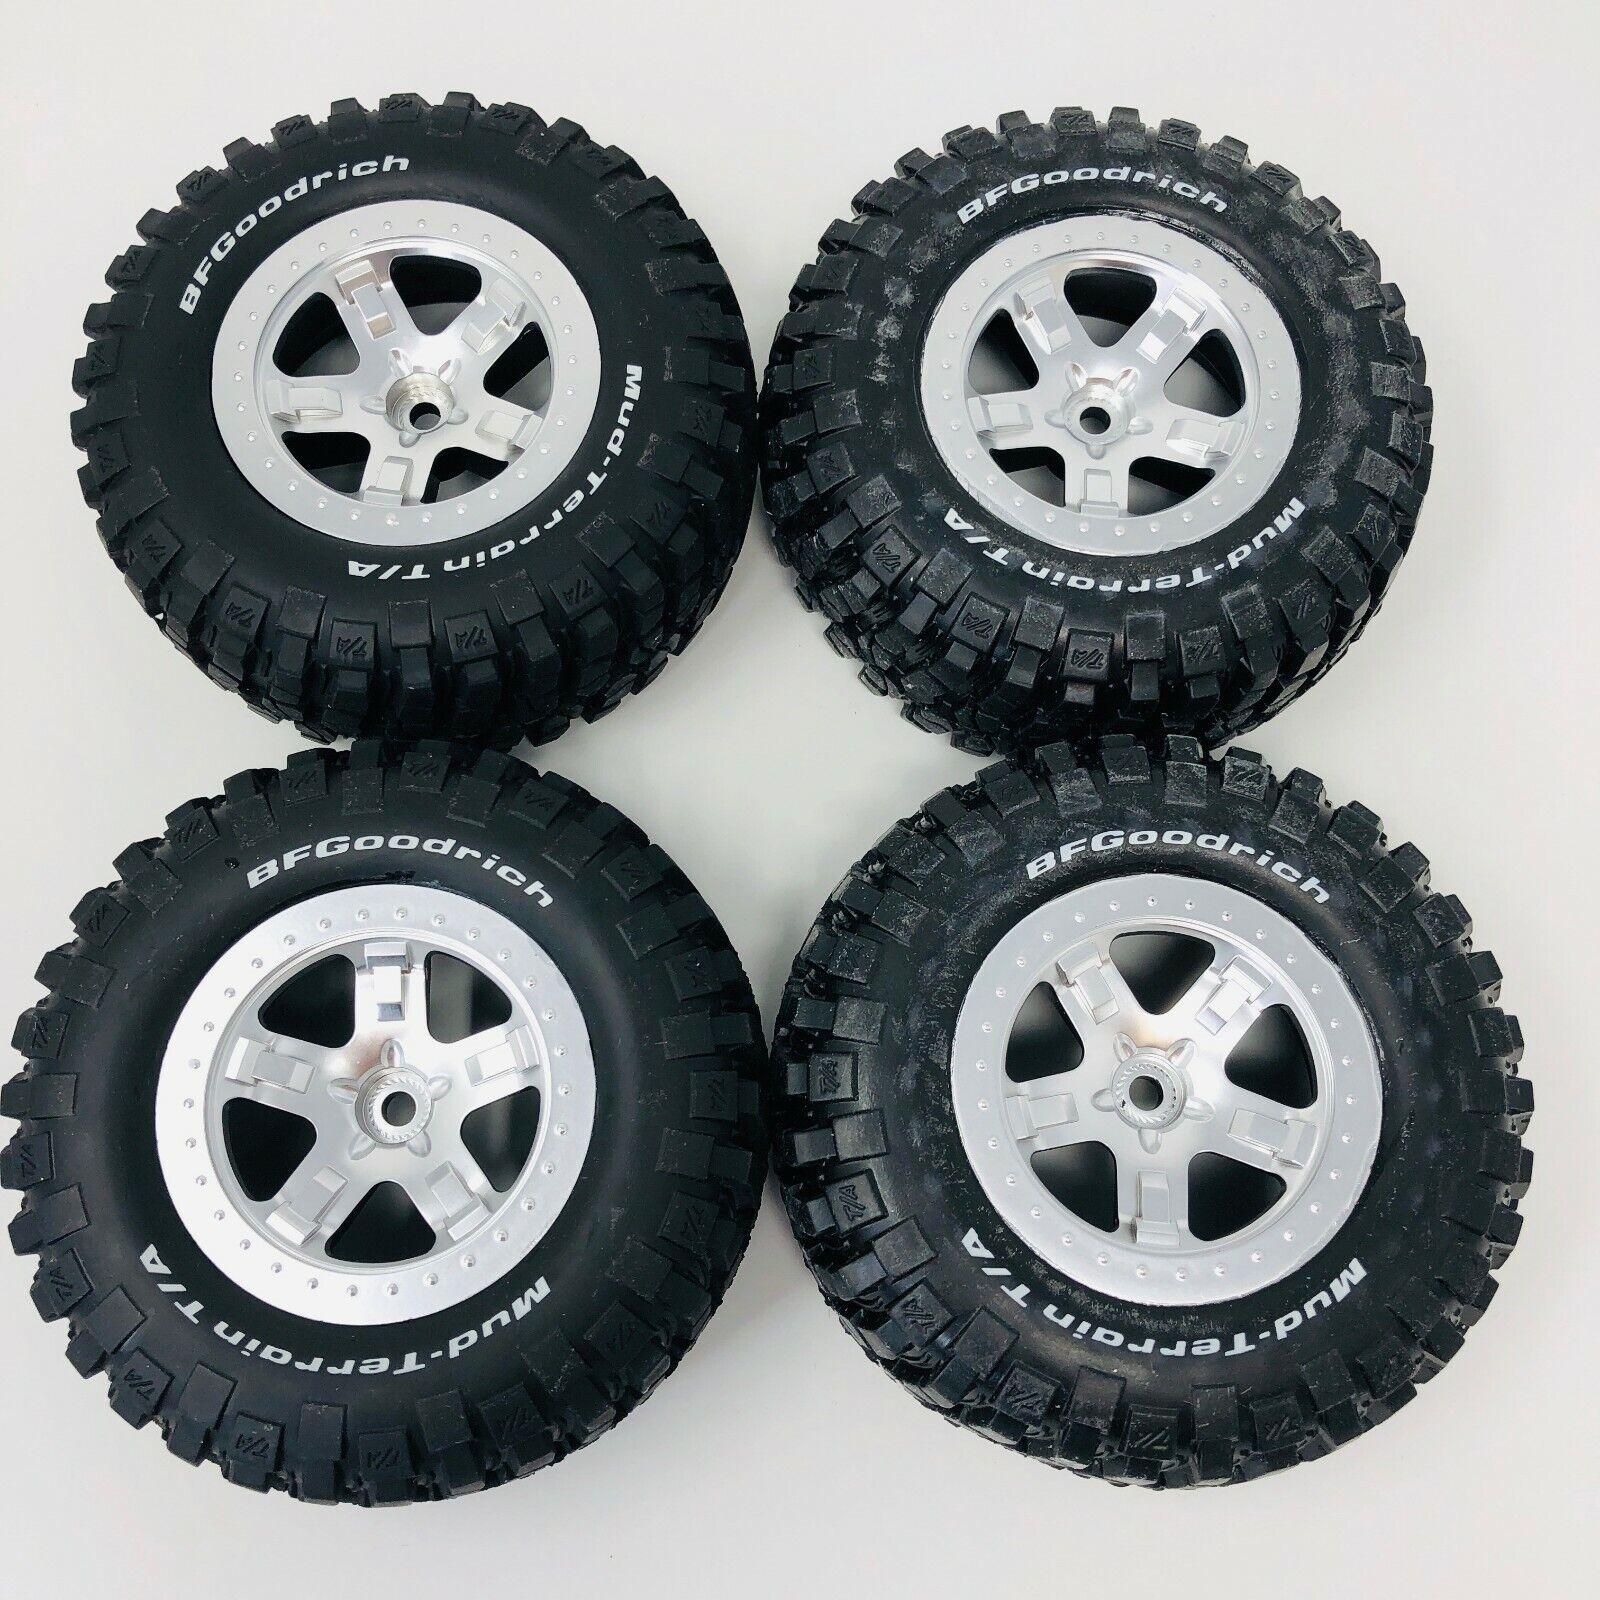 Traxxas Front & Rear Satin Chrome Wheels - SCT Split Spoke (x4) Bf Goodrich New